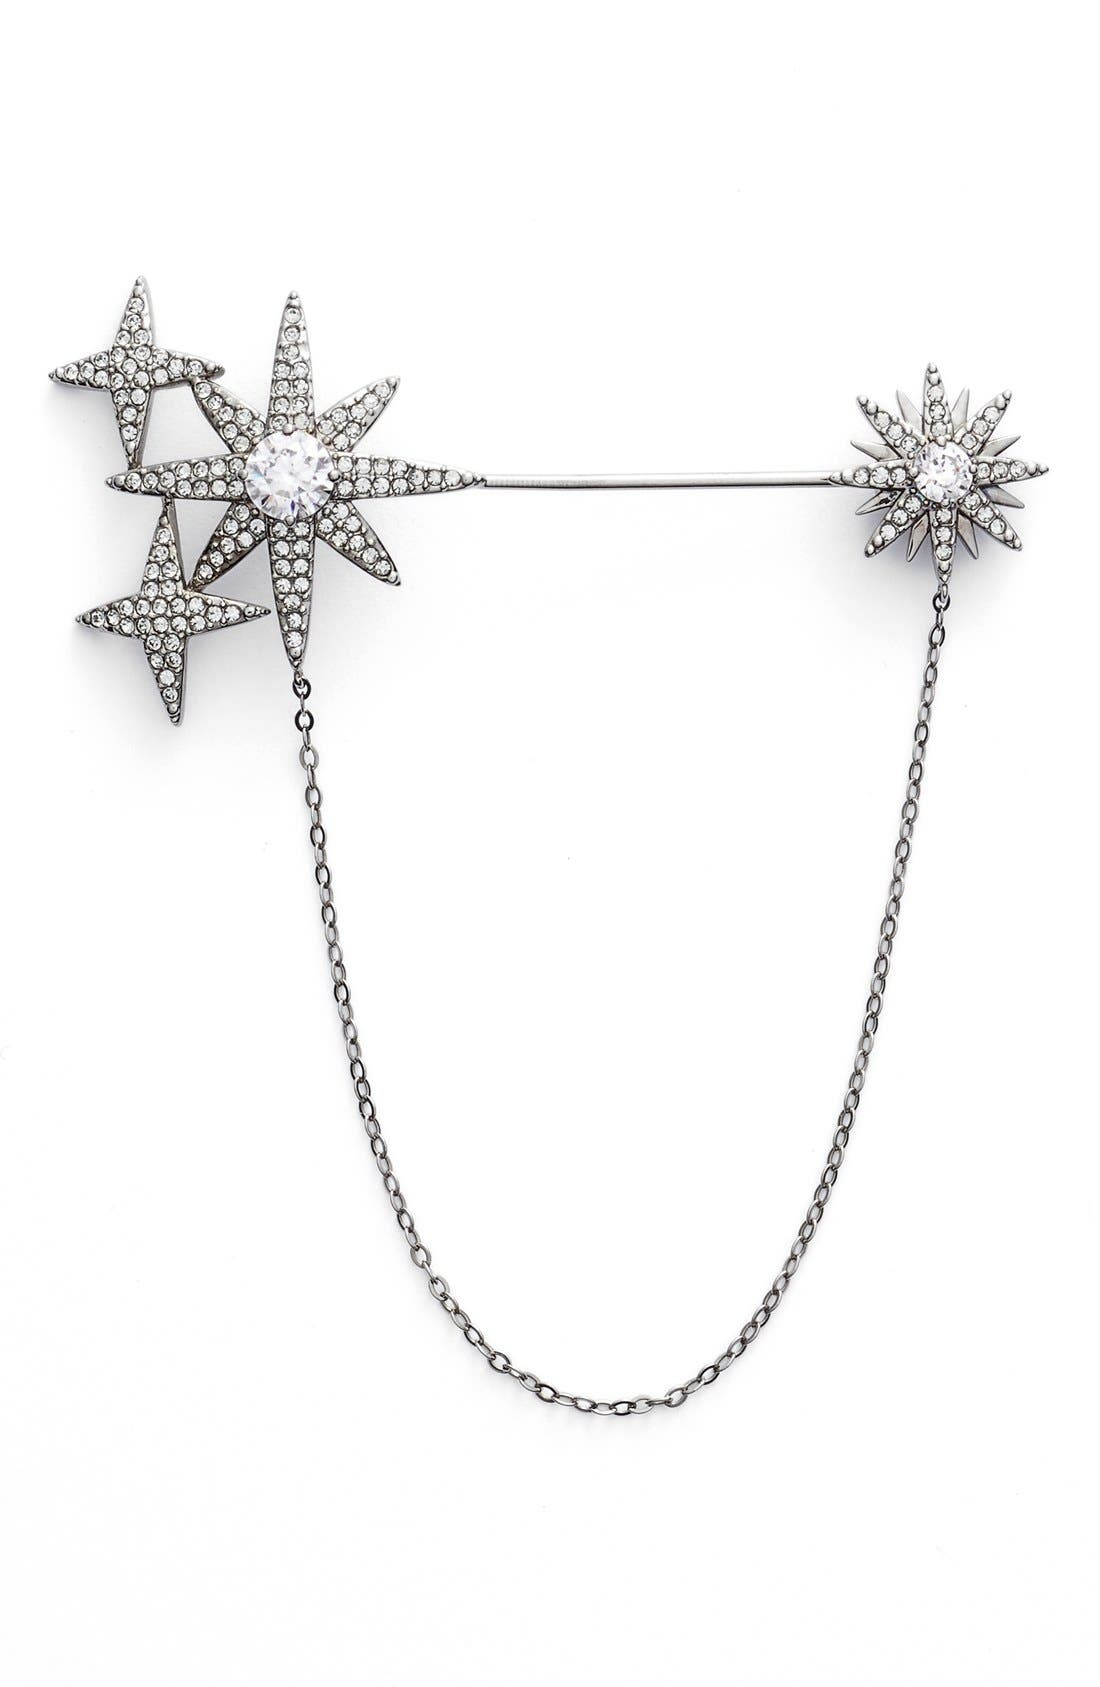 Main Image - Nadri Stardust Cubic Zirconia Brooch